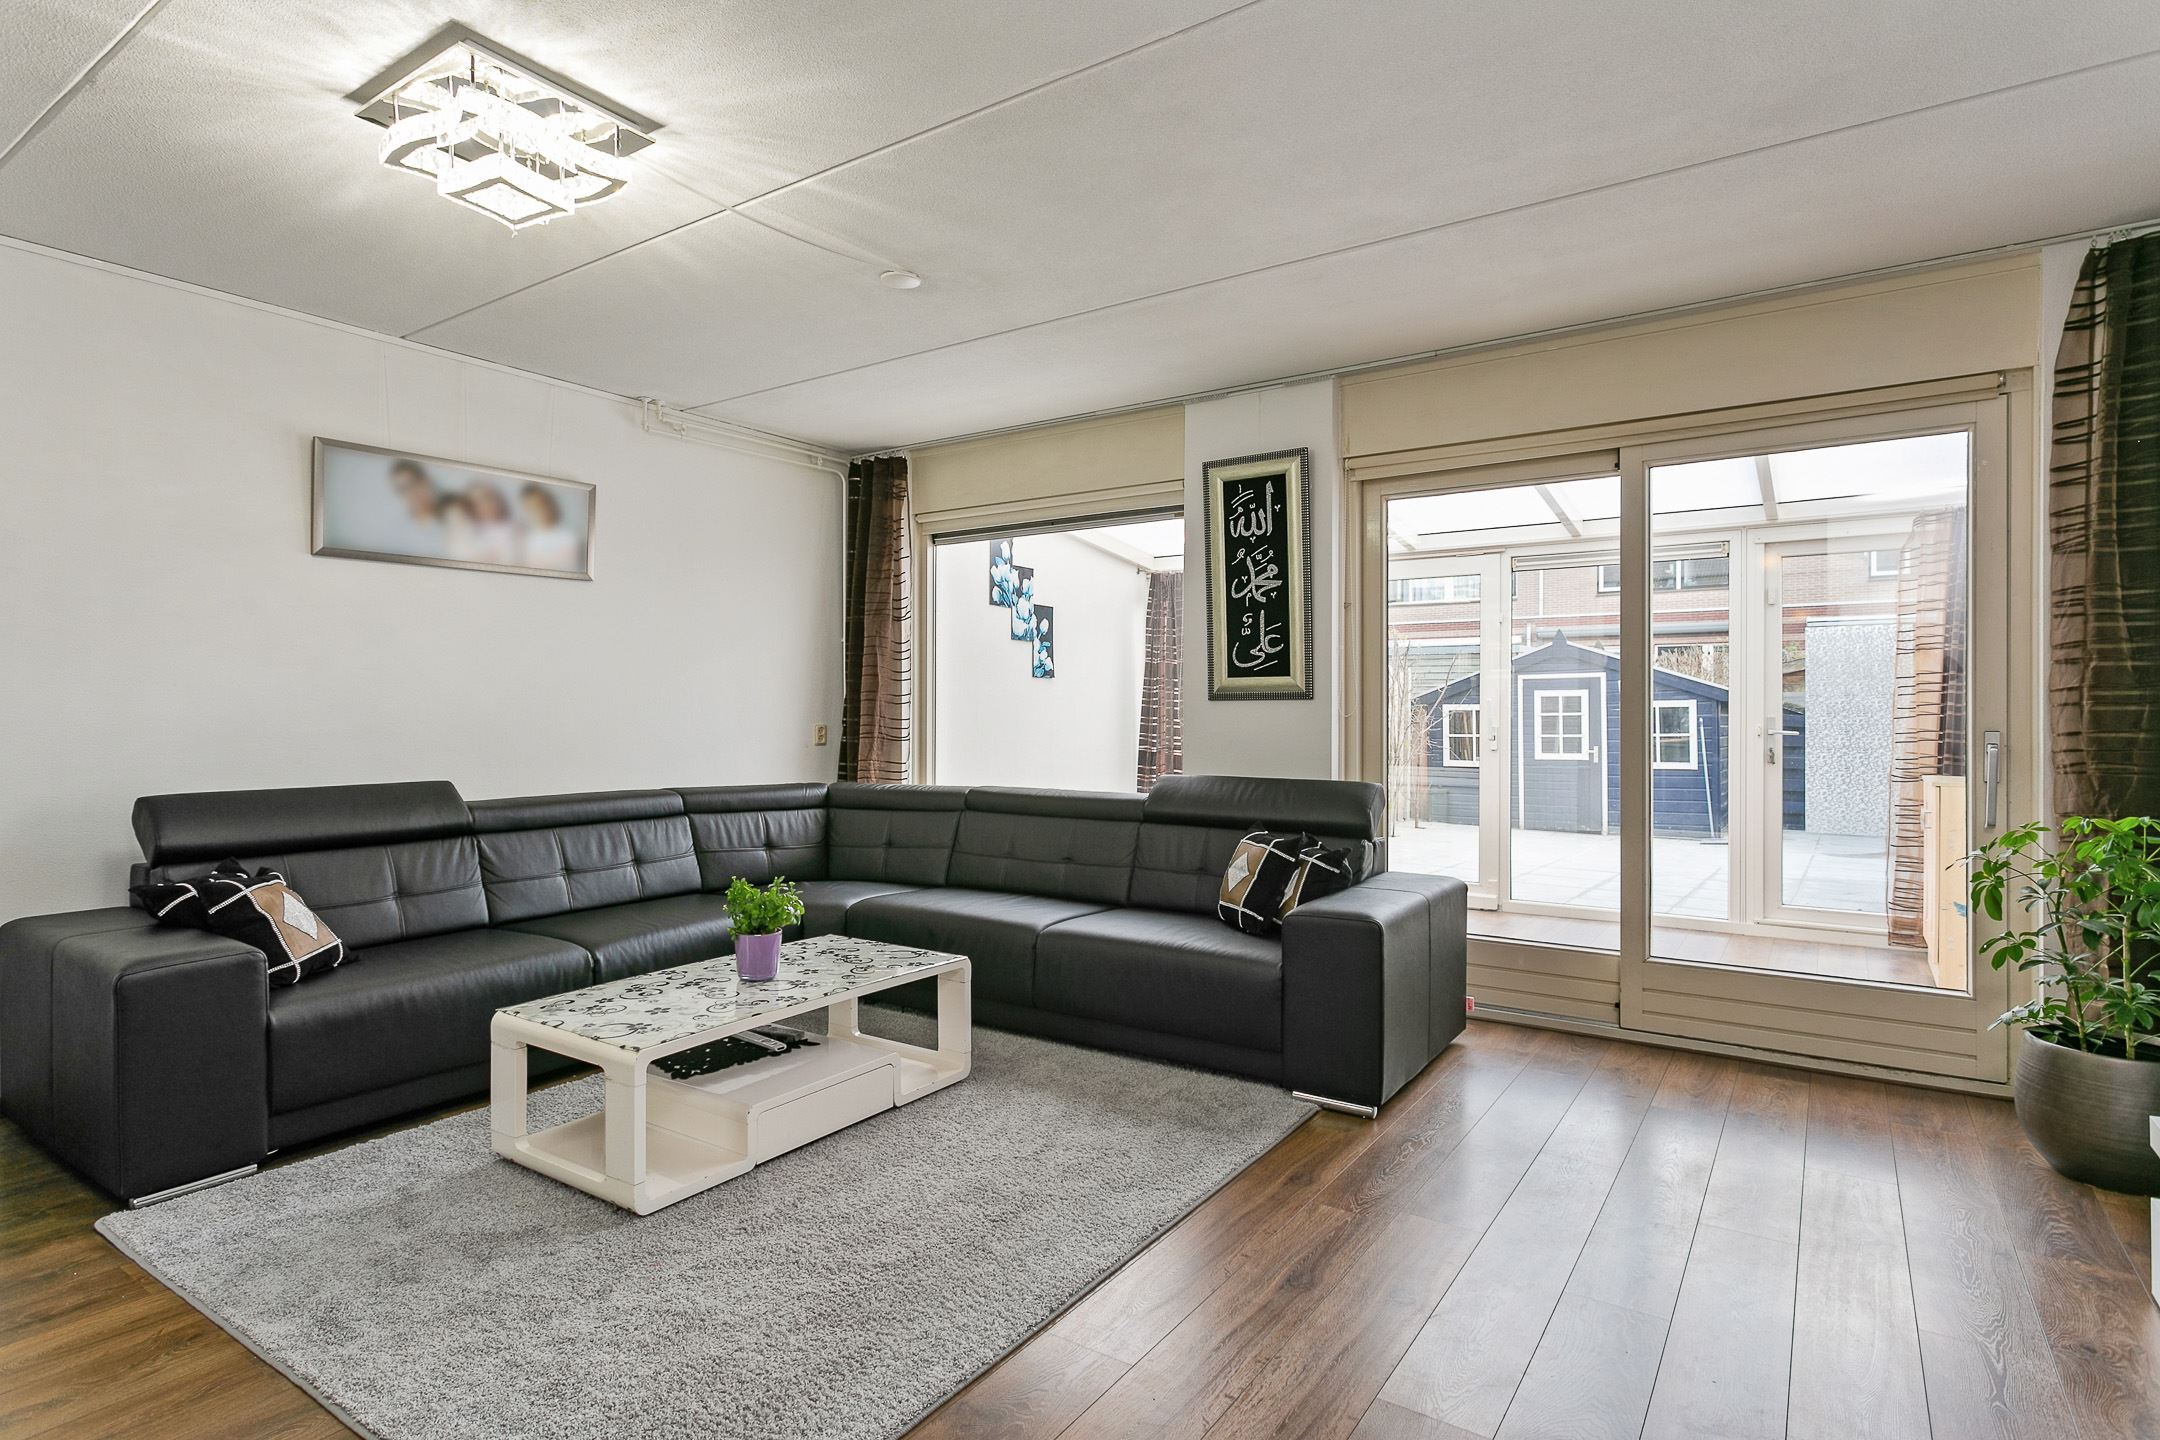 Huis te koop griete wolfsstraat hb zutphen funda